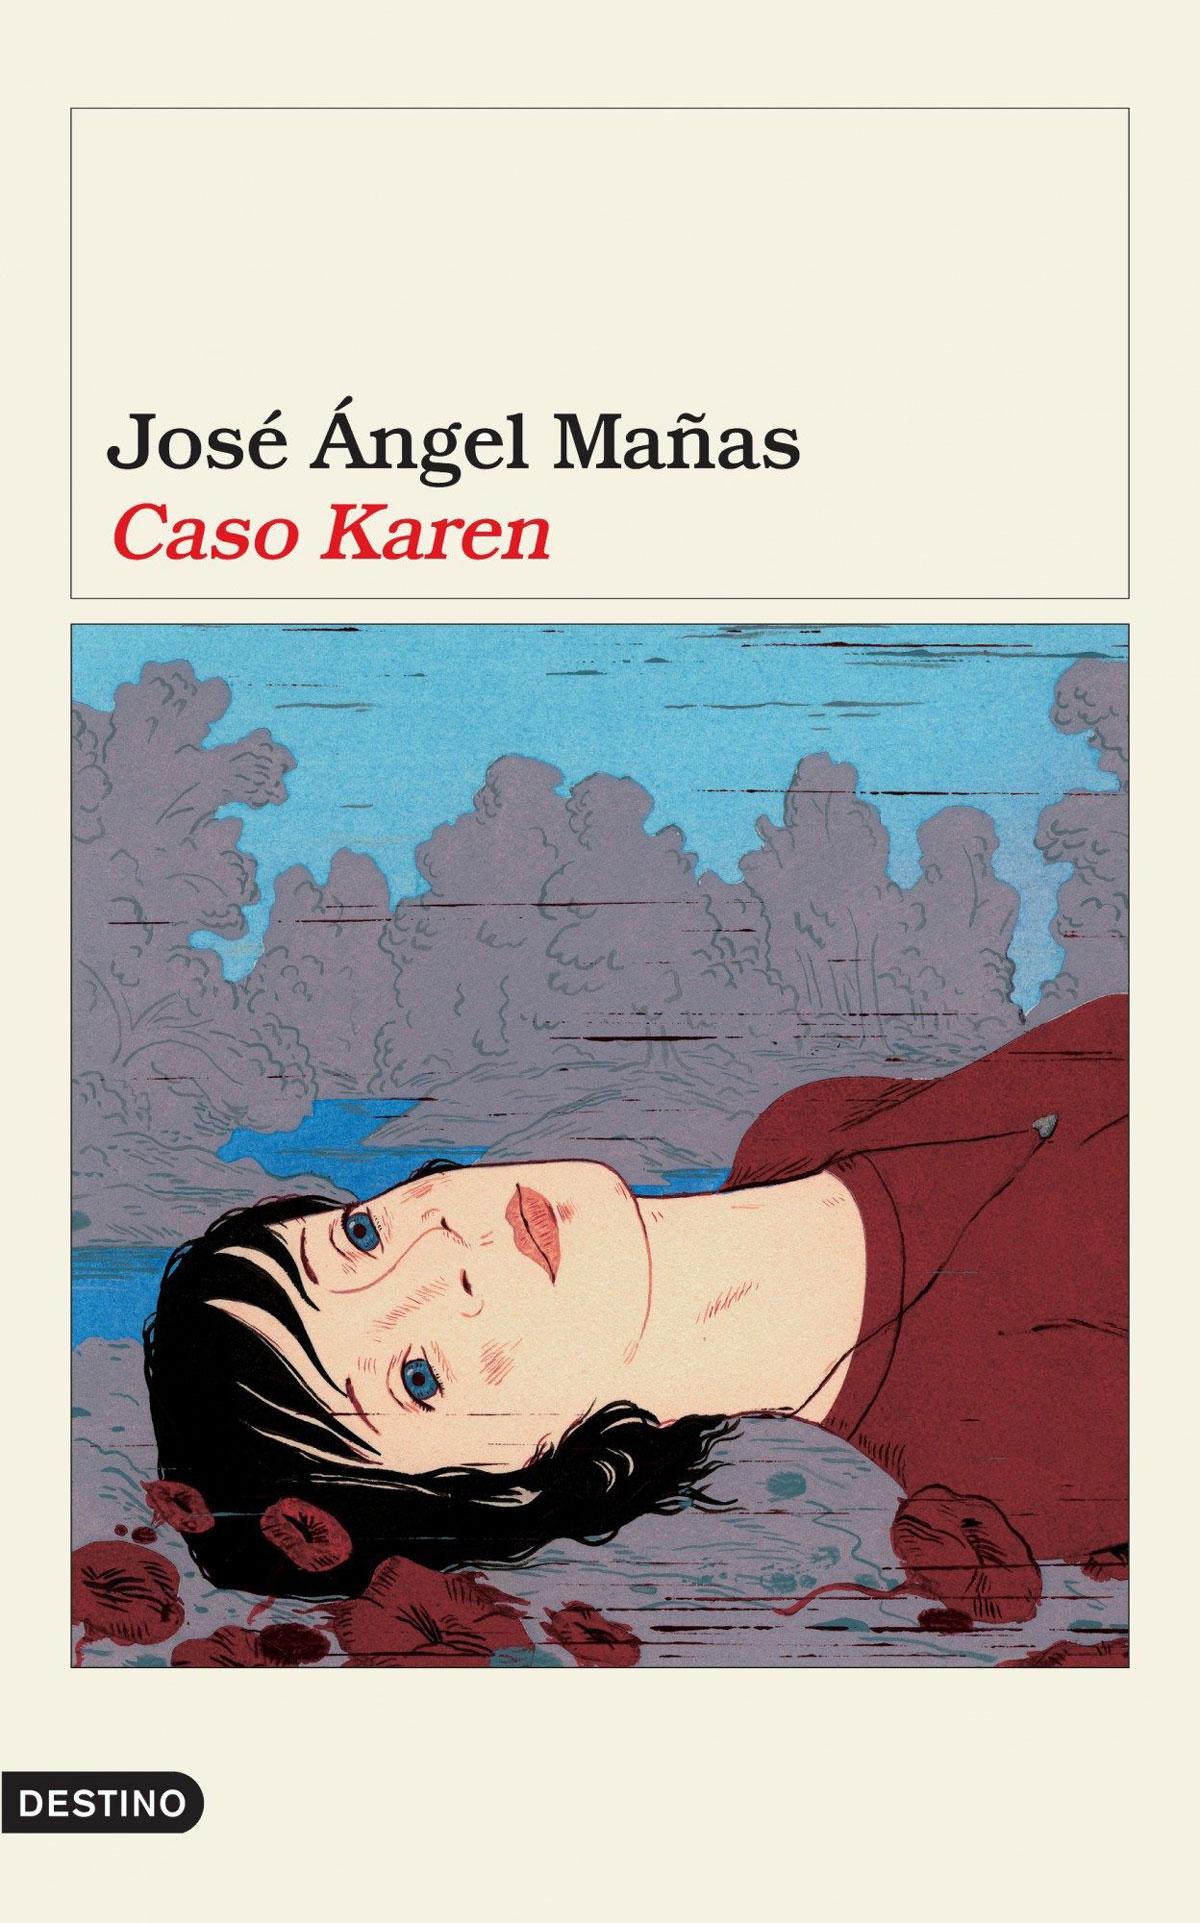 Portada de la novela Caso Karen, de José Ángel Mañas